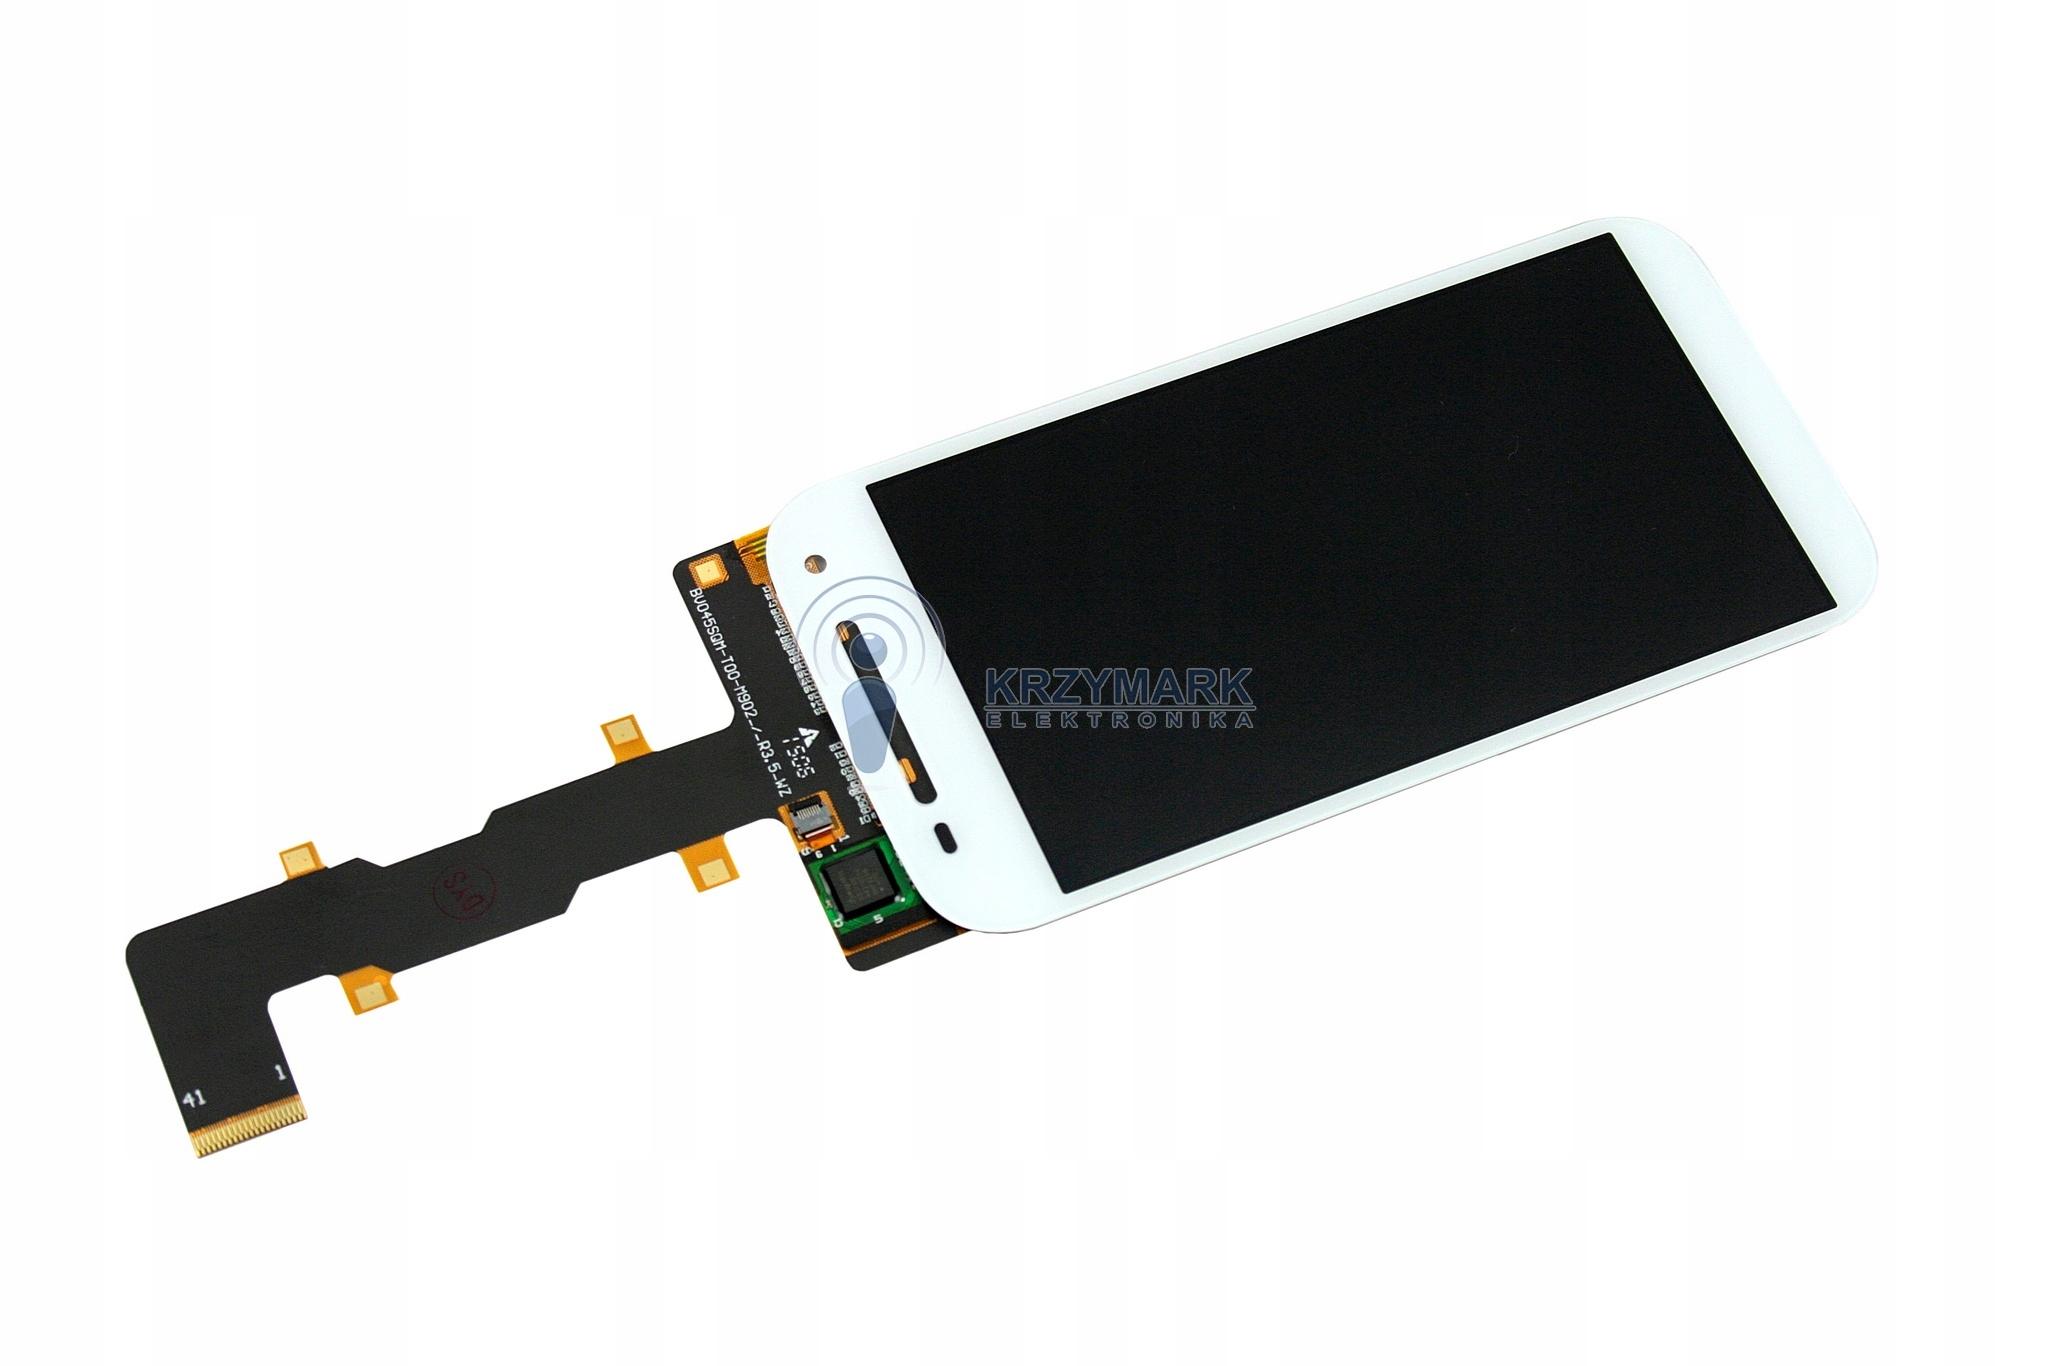 LCD EKRAN WYŚWIETLACZ MOTOROLA MOTO E2 XT1524 4G E